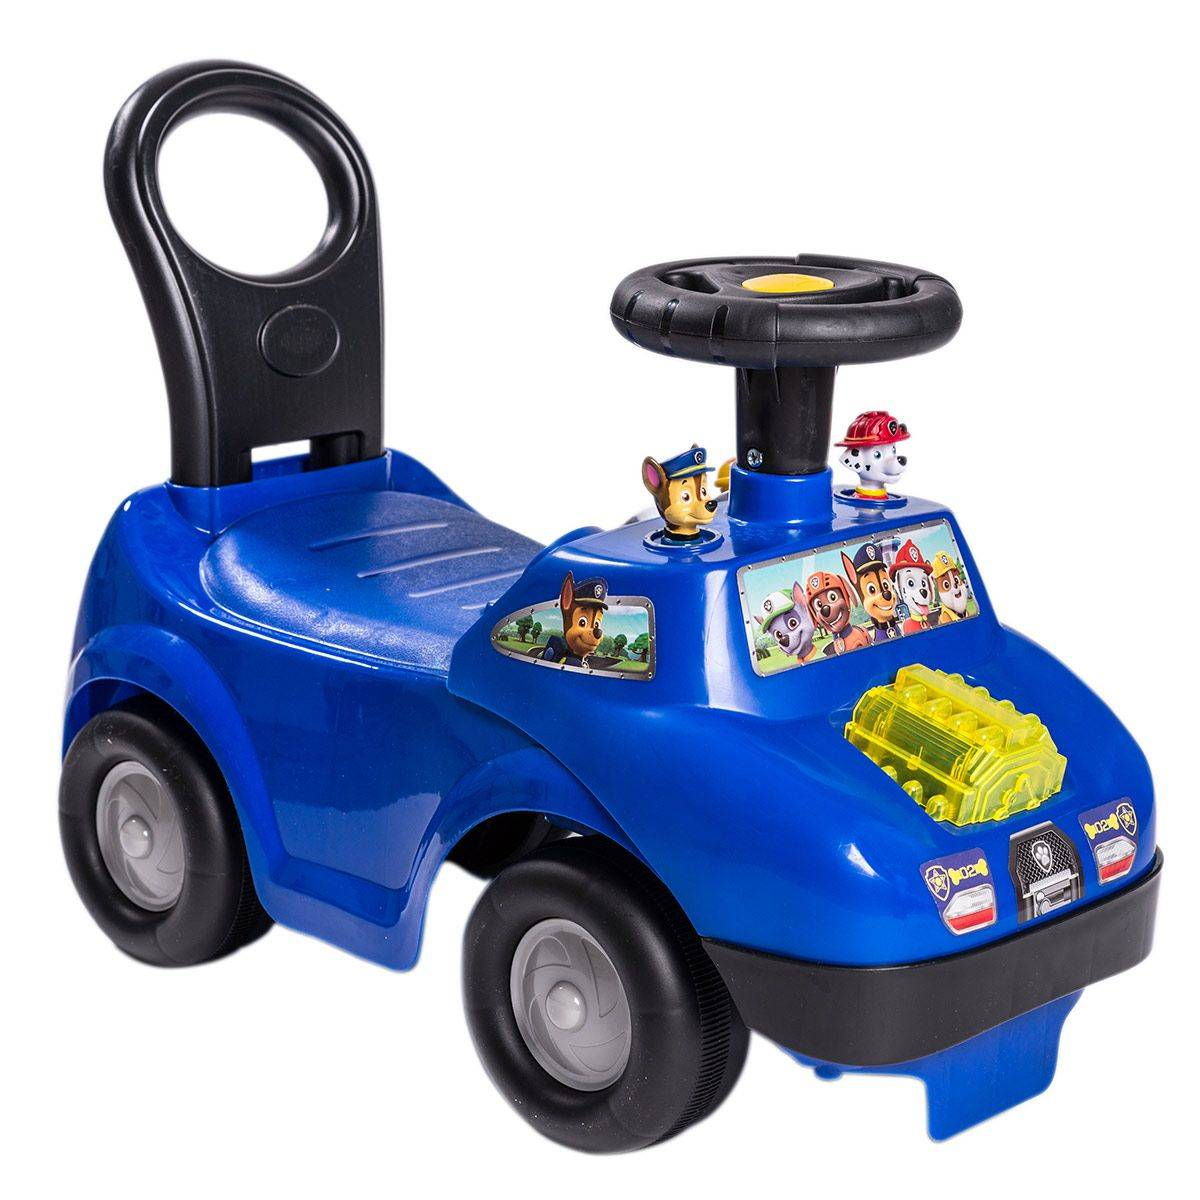 Kiddieland Paw Patrol Police Ride On (401004)